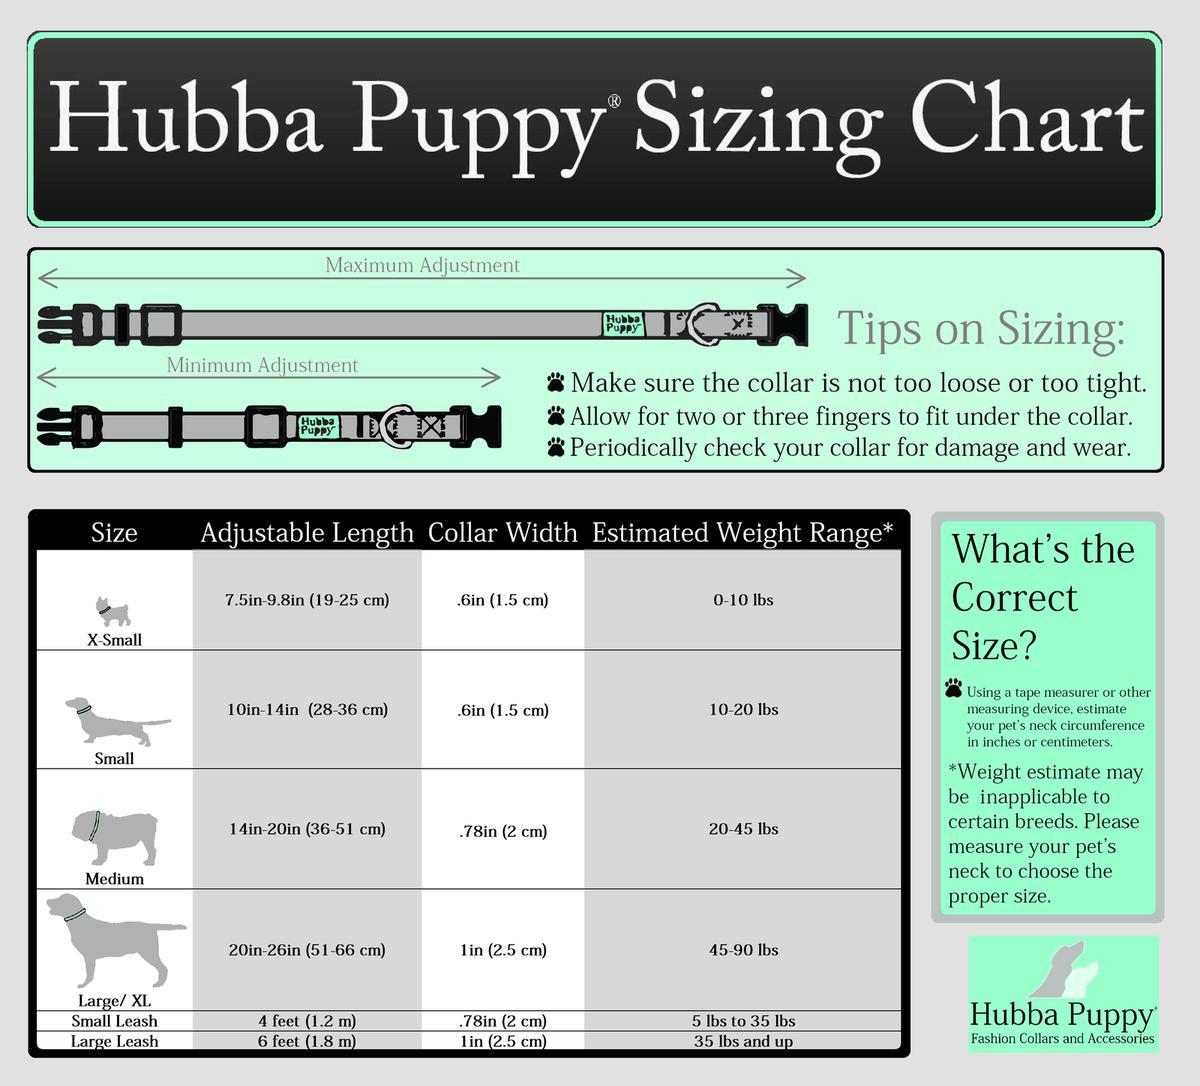 Hubba Puppy Pet Collars